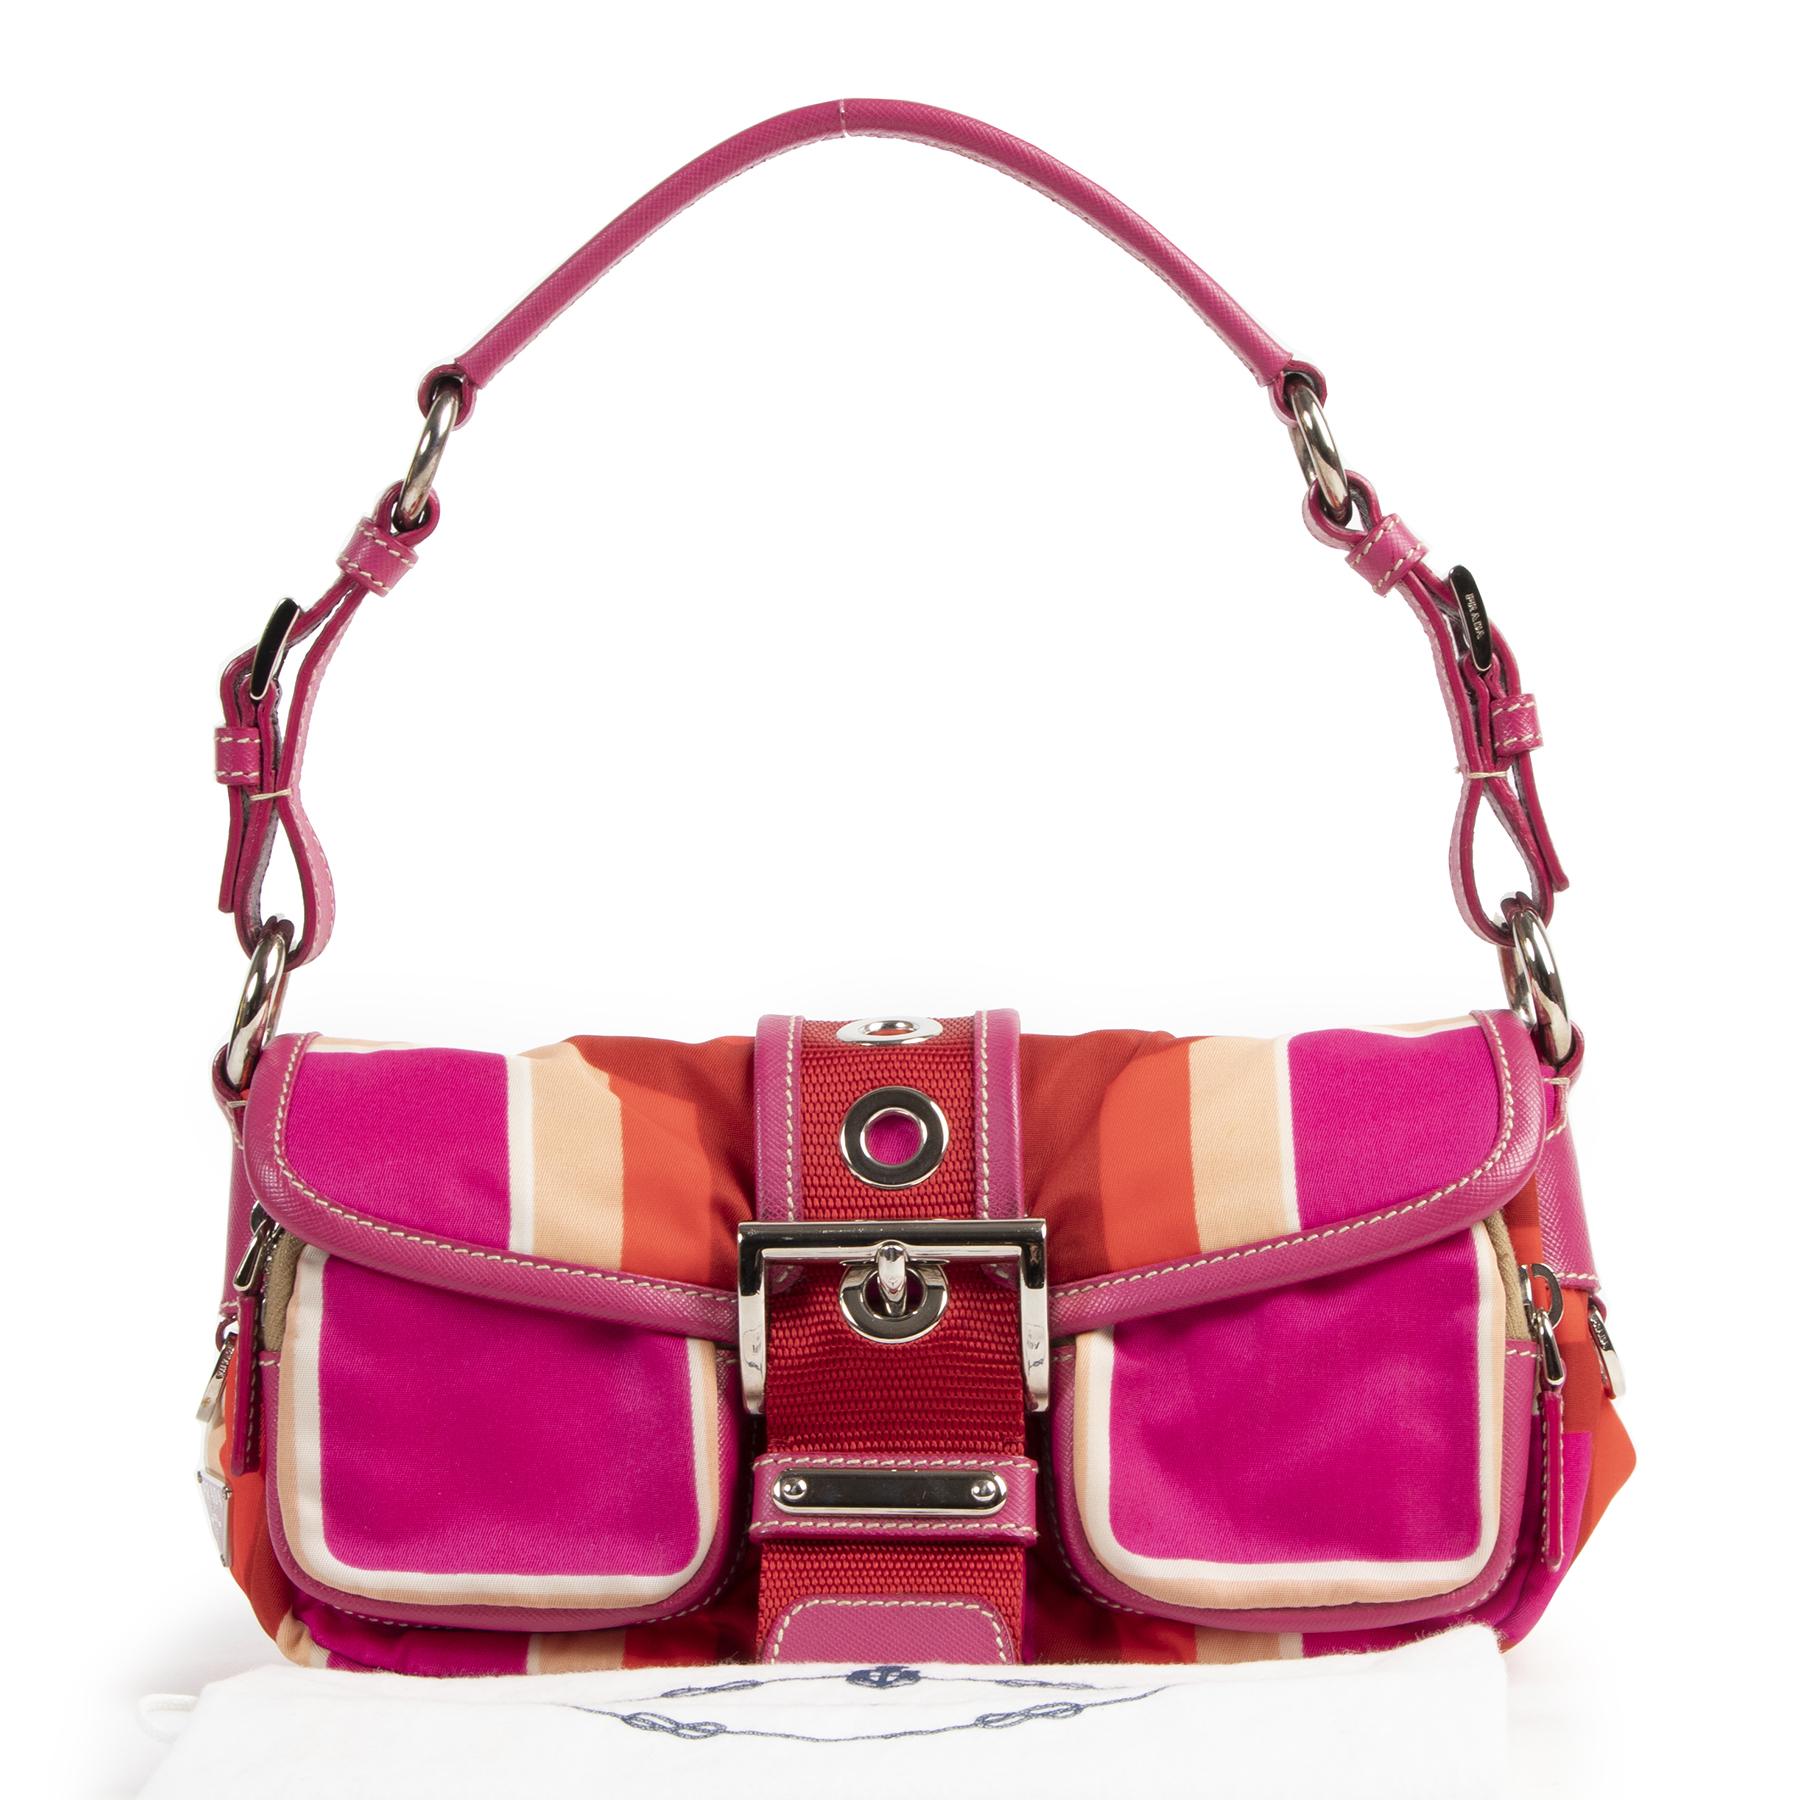 Prada Fuchsia Buckle Nylon Shoulder Bag